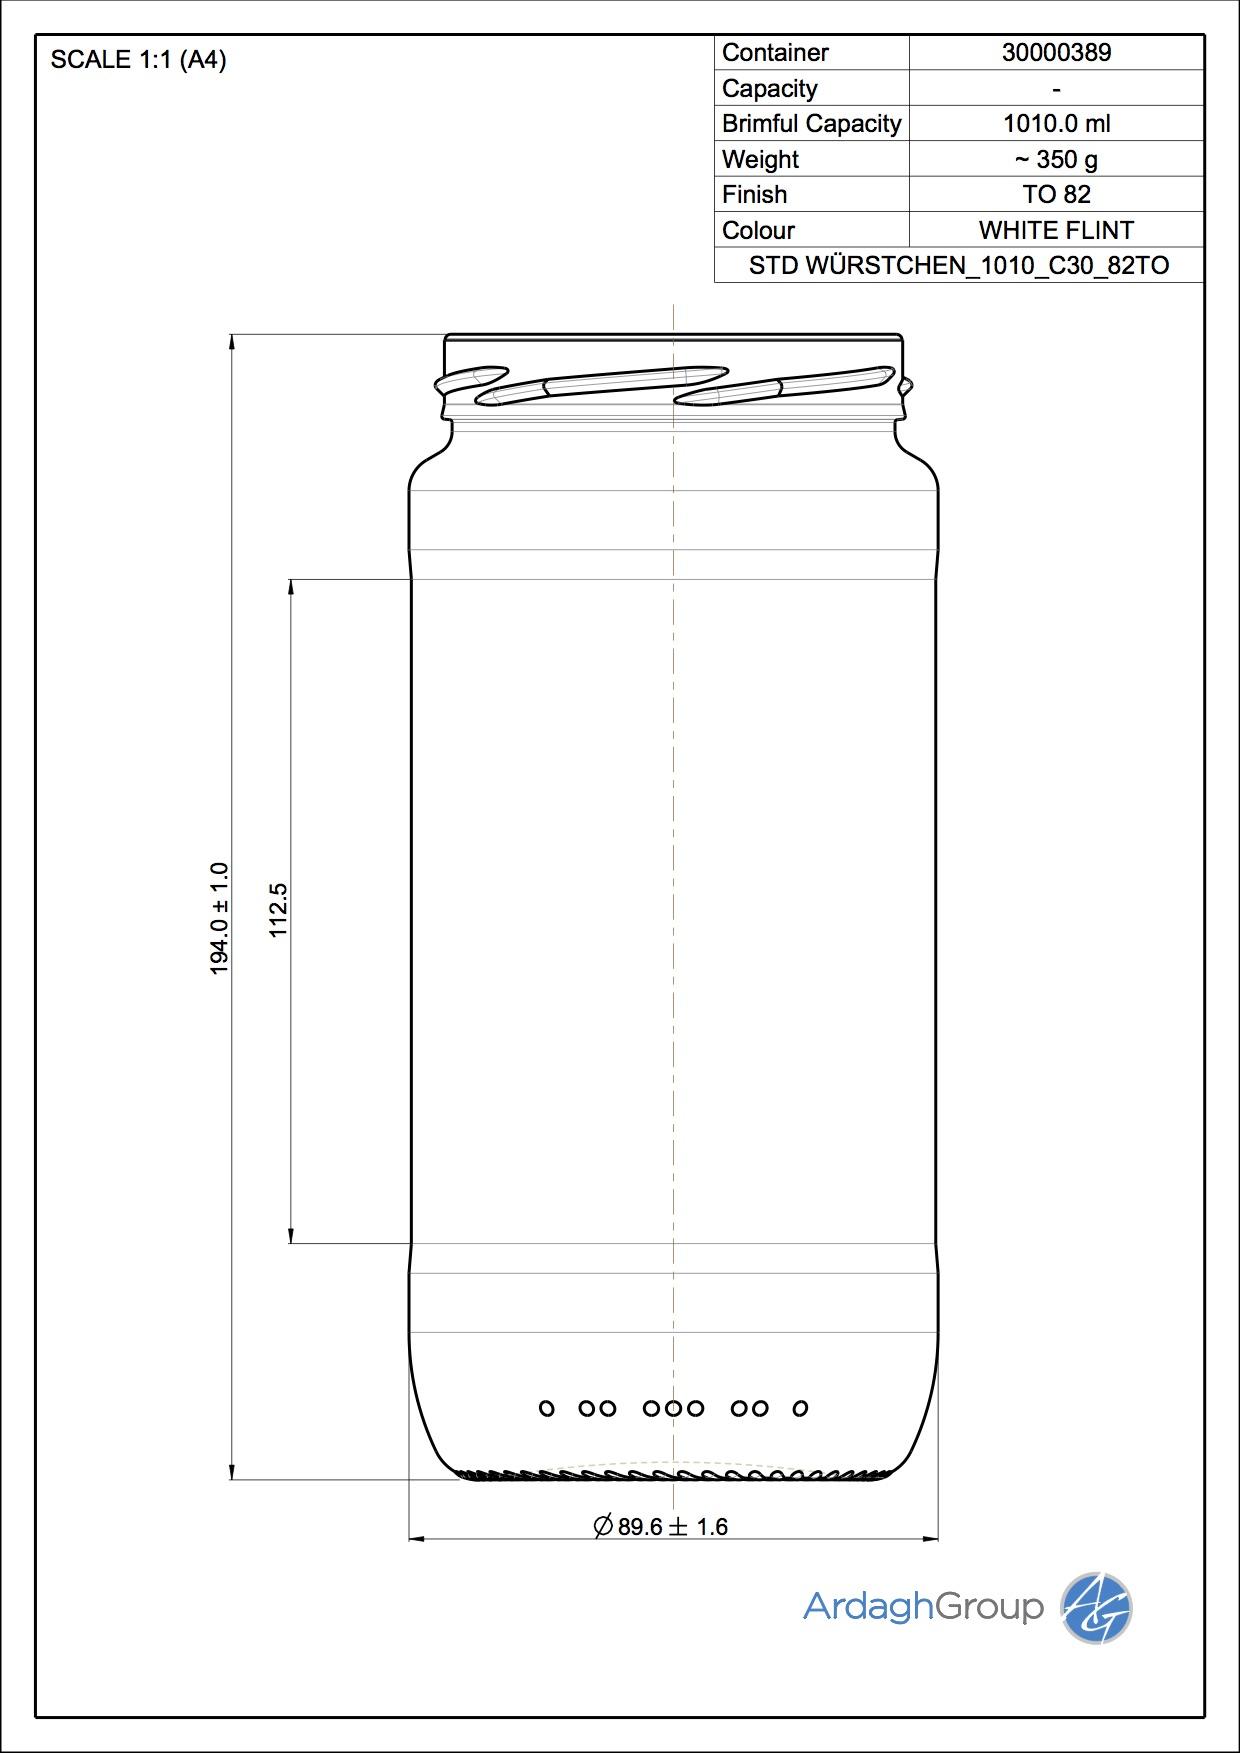 Wuerstchenglas 1010 C30 82TO